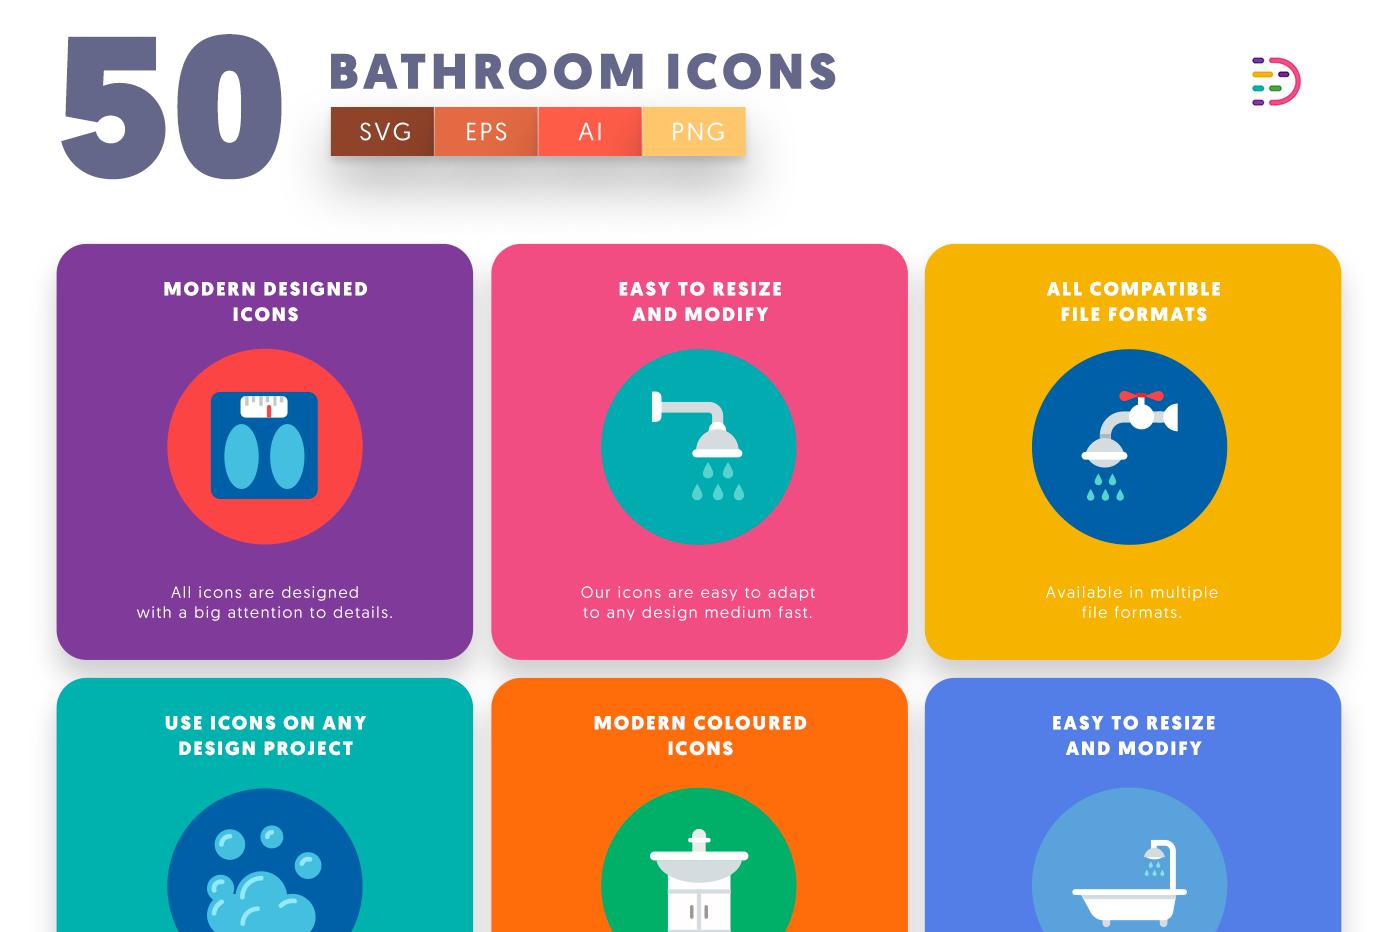 Customizable and vector 50 Bathroom Icons